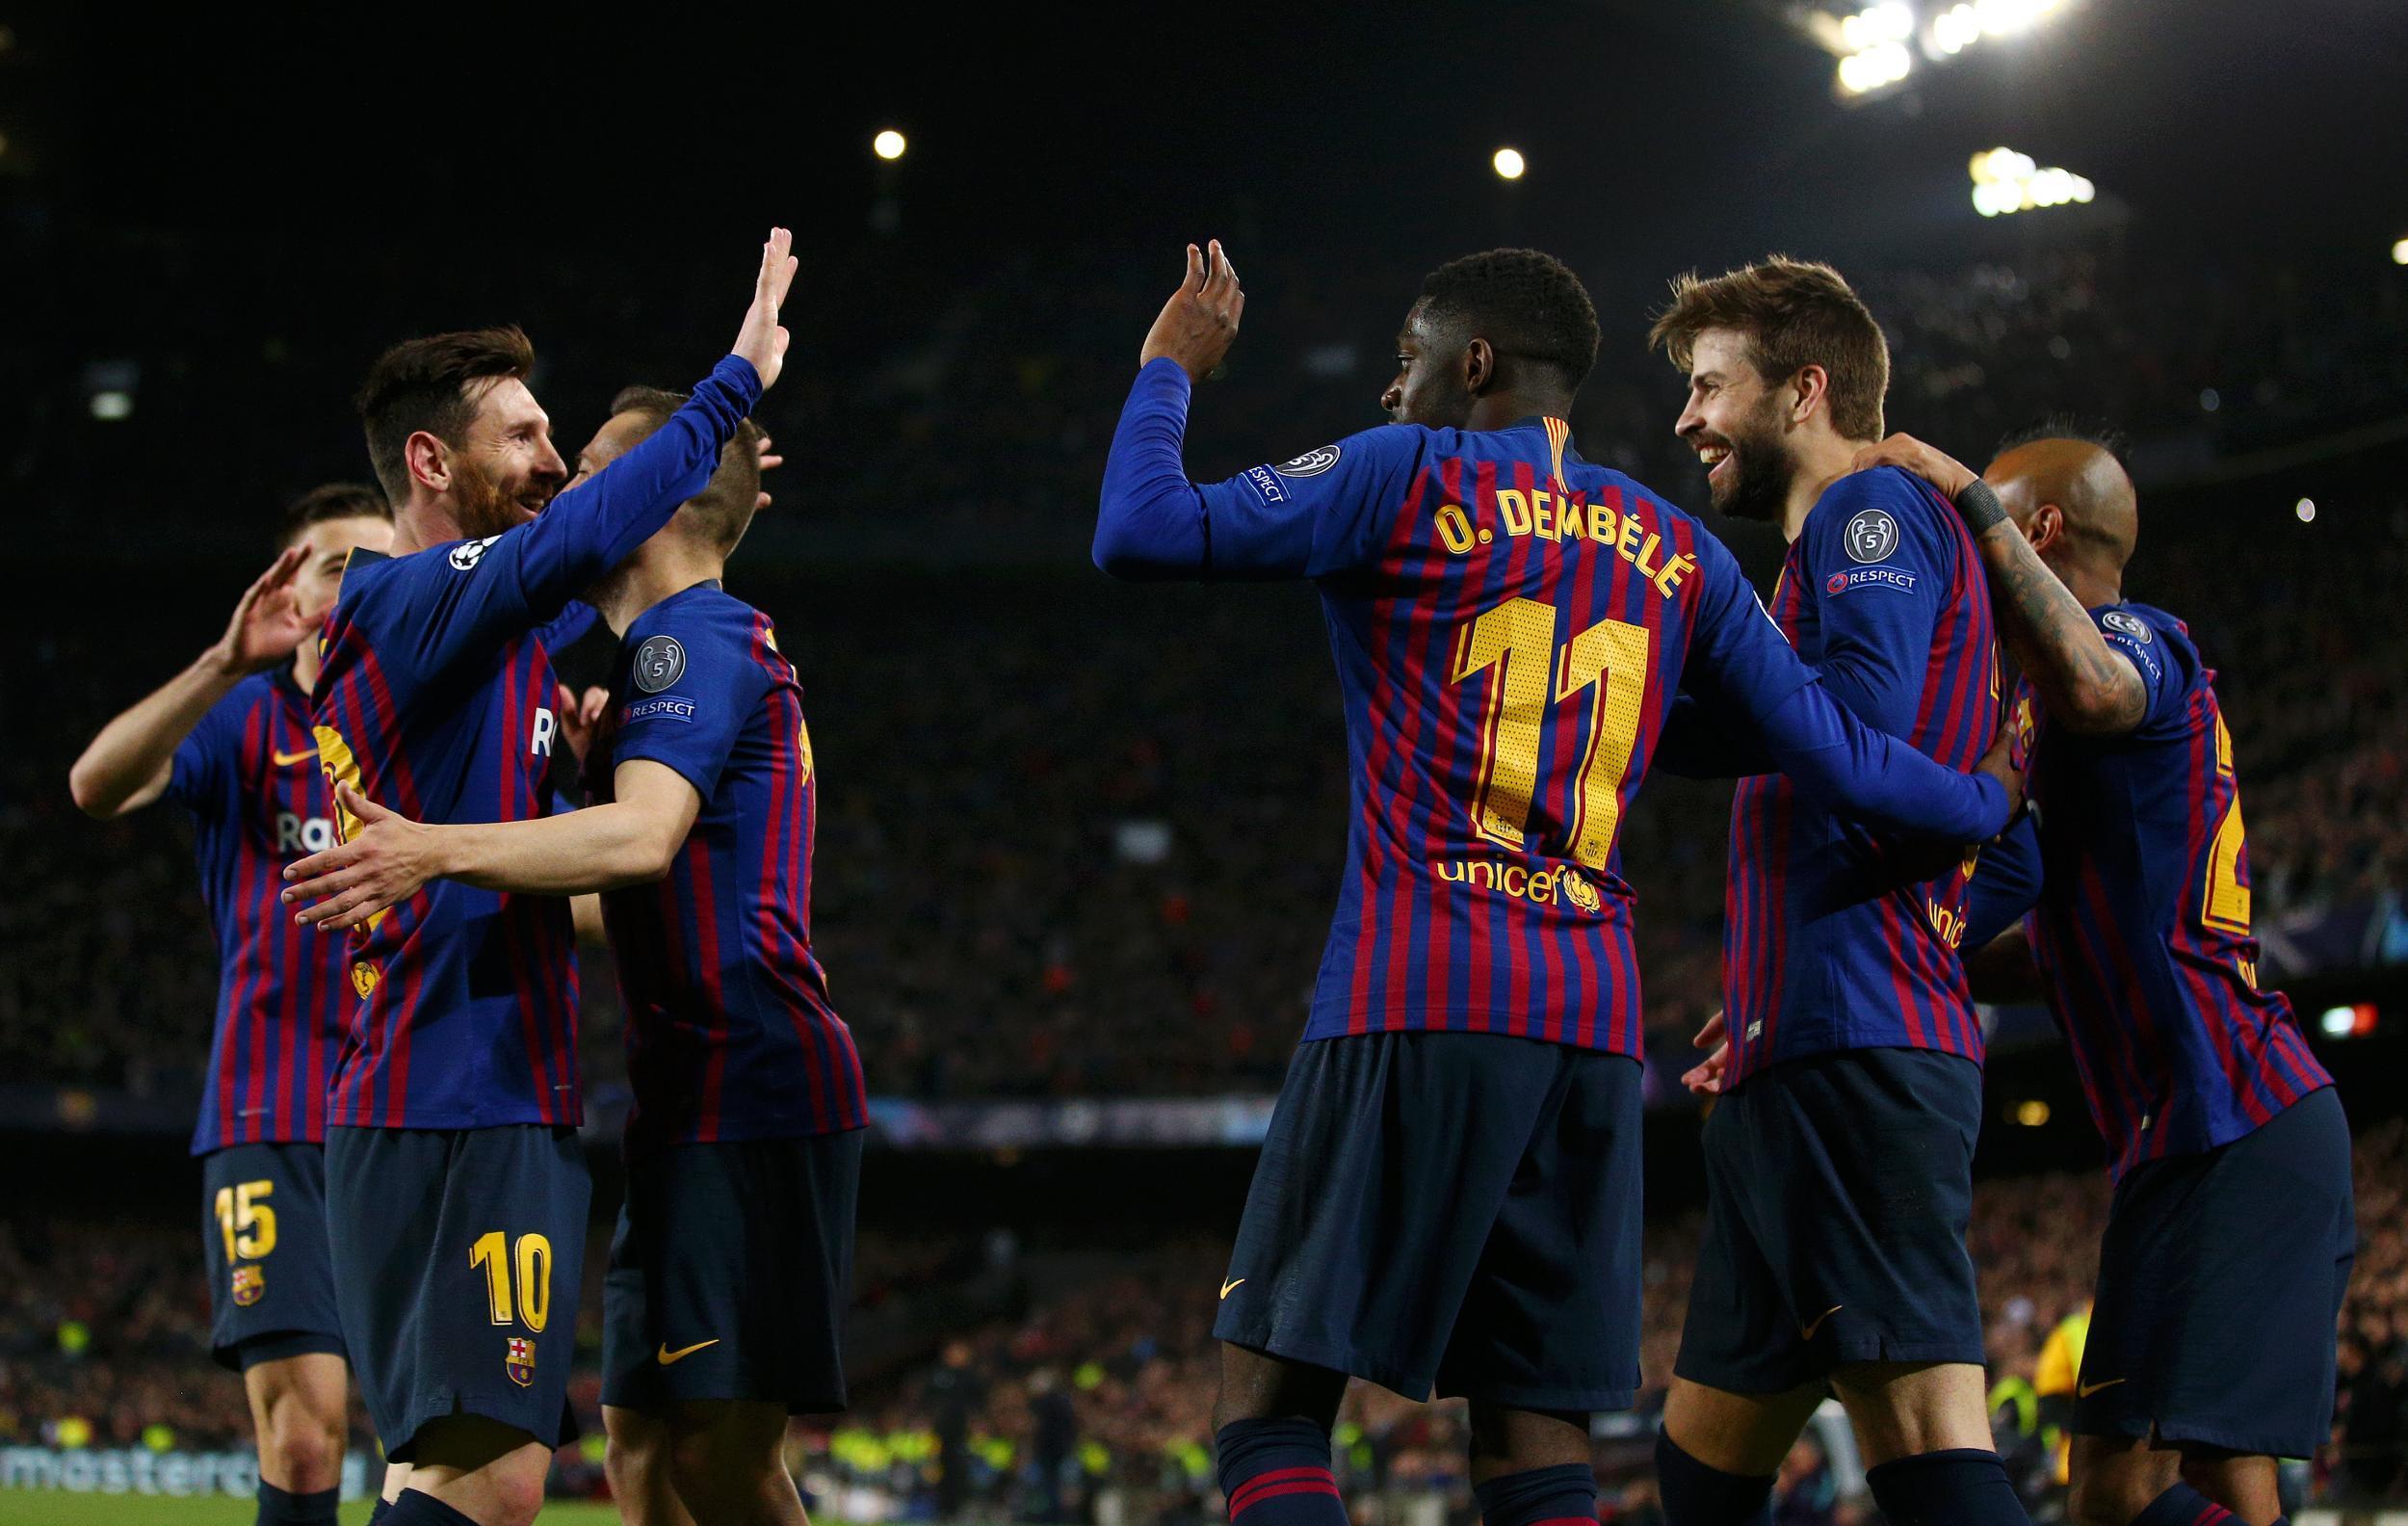 La Liga Champions Barcelona 2019 Wallpapers